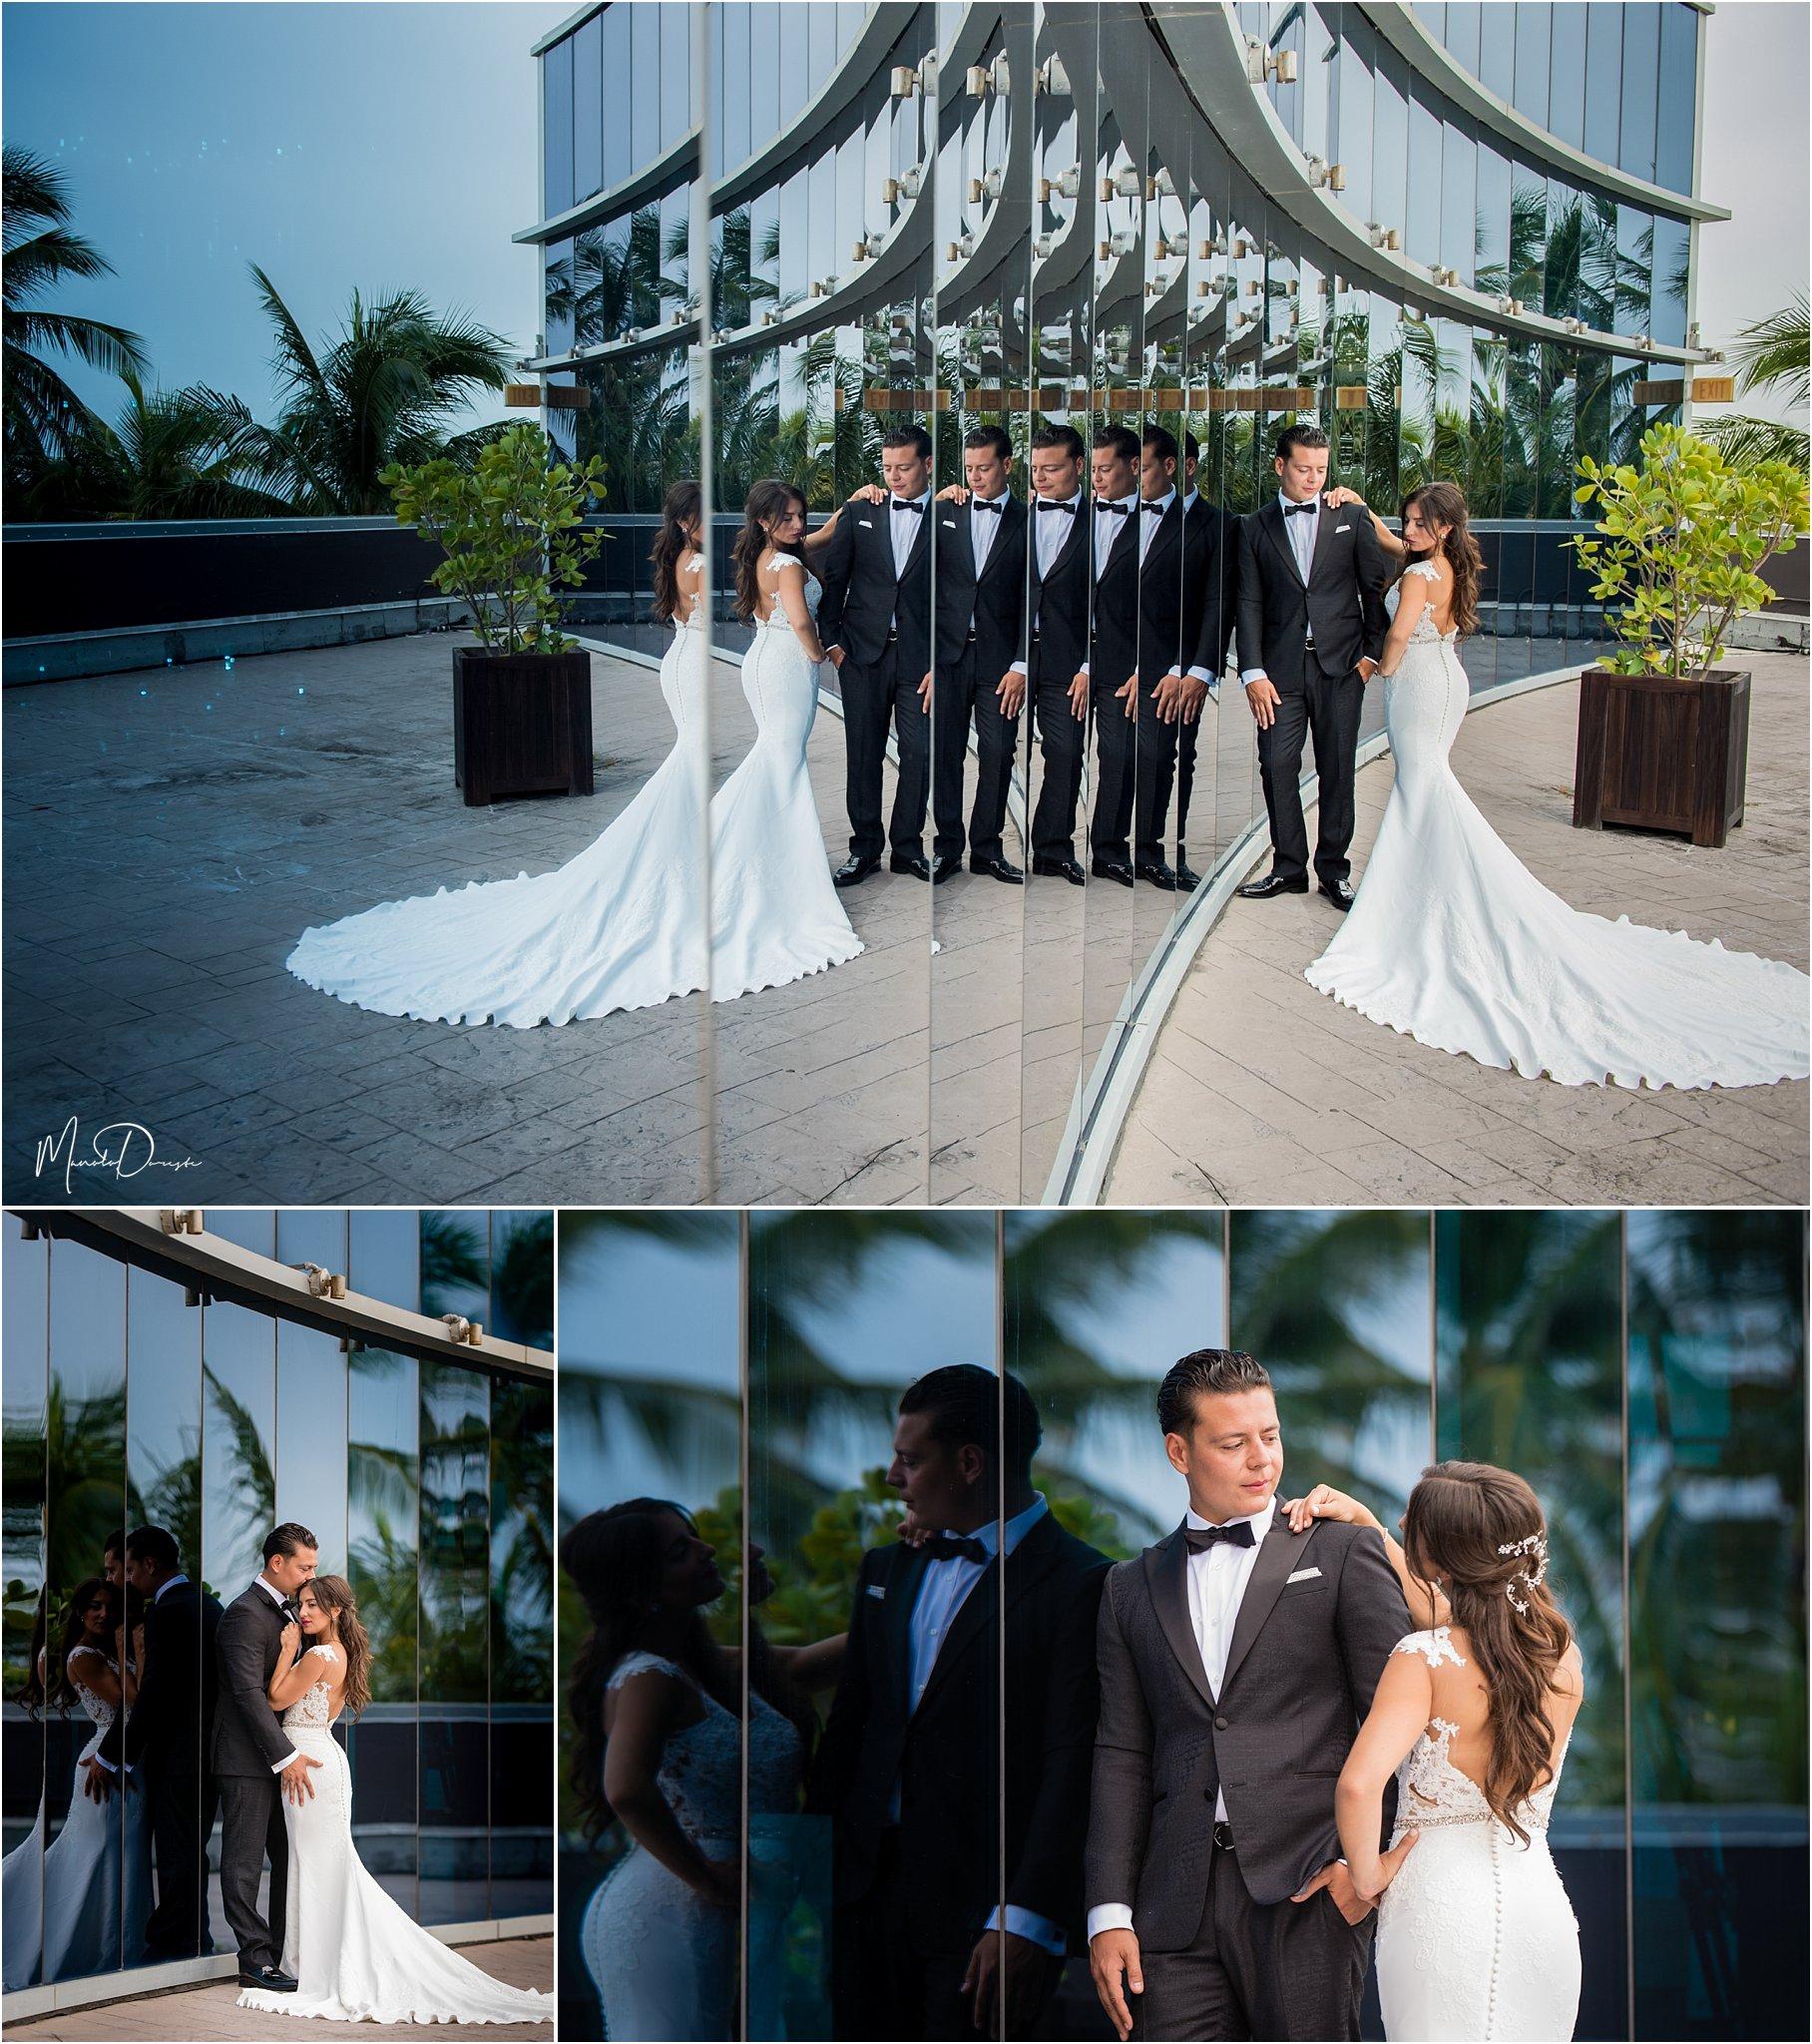 0327_ManoloDoreste_InFocusStudios_Wedding_Family_Photography_Miami_MiamiPhotographer.jpg